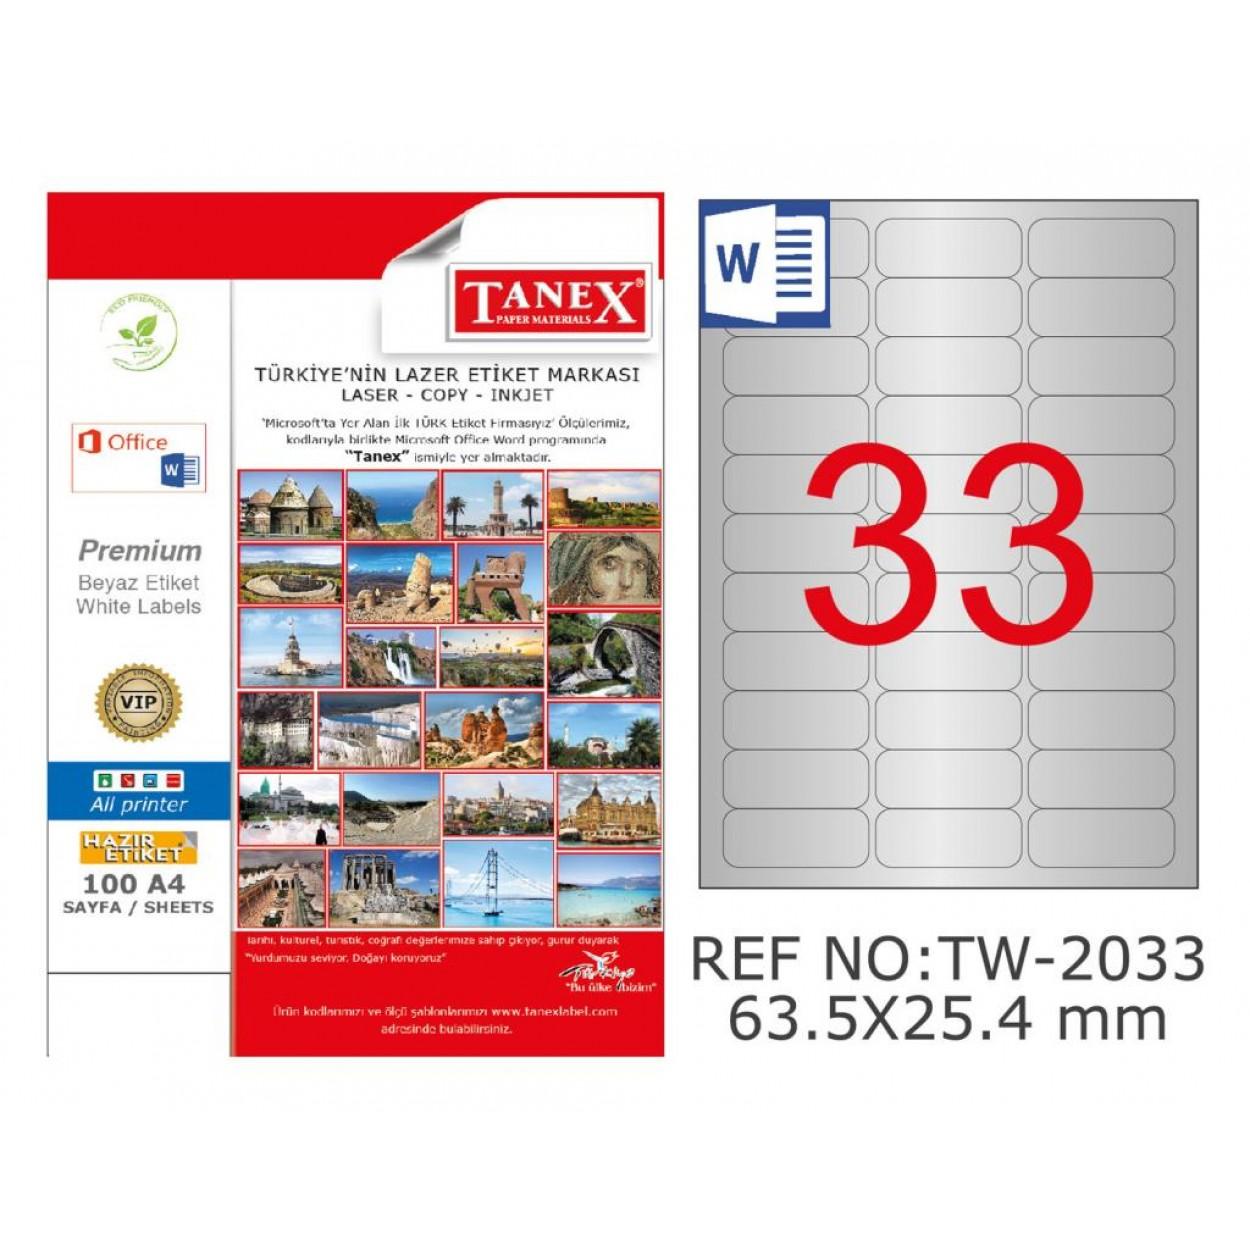 Tanex TW-2033 63.5x25.4 mm Gümüş Lazer Etiket 825 Li